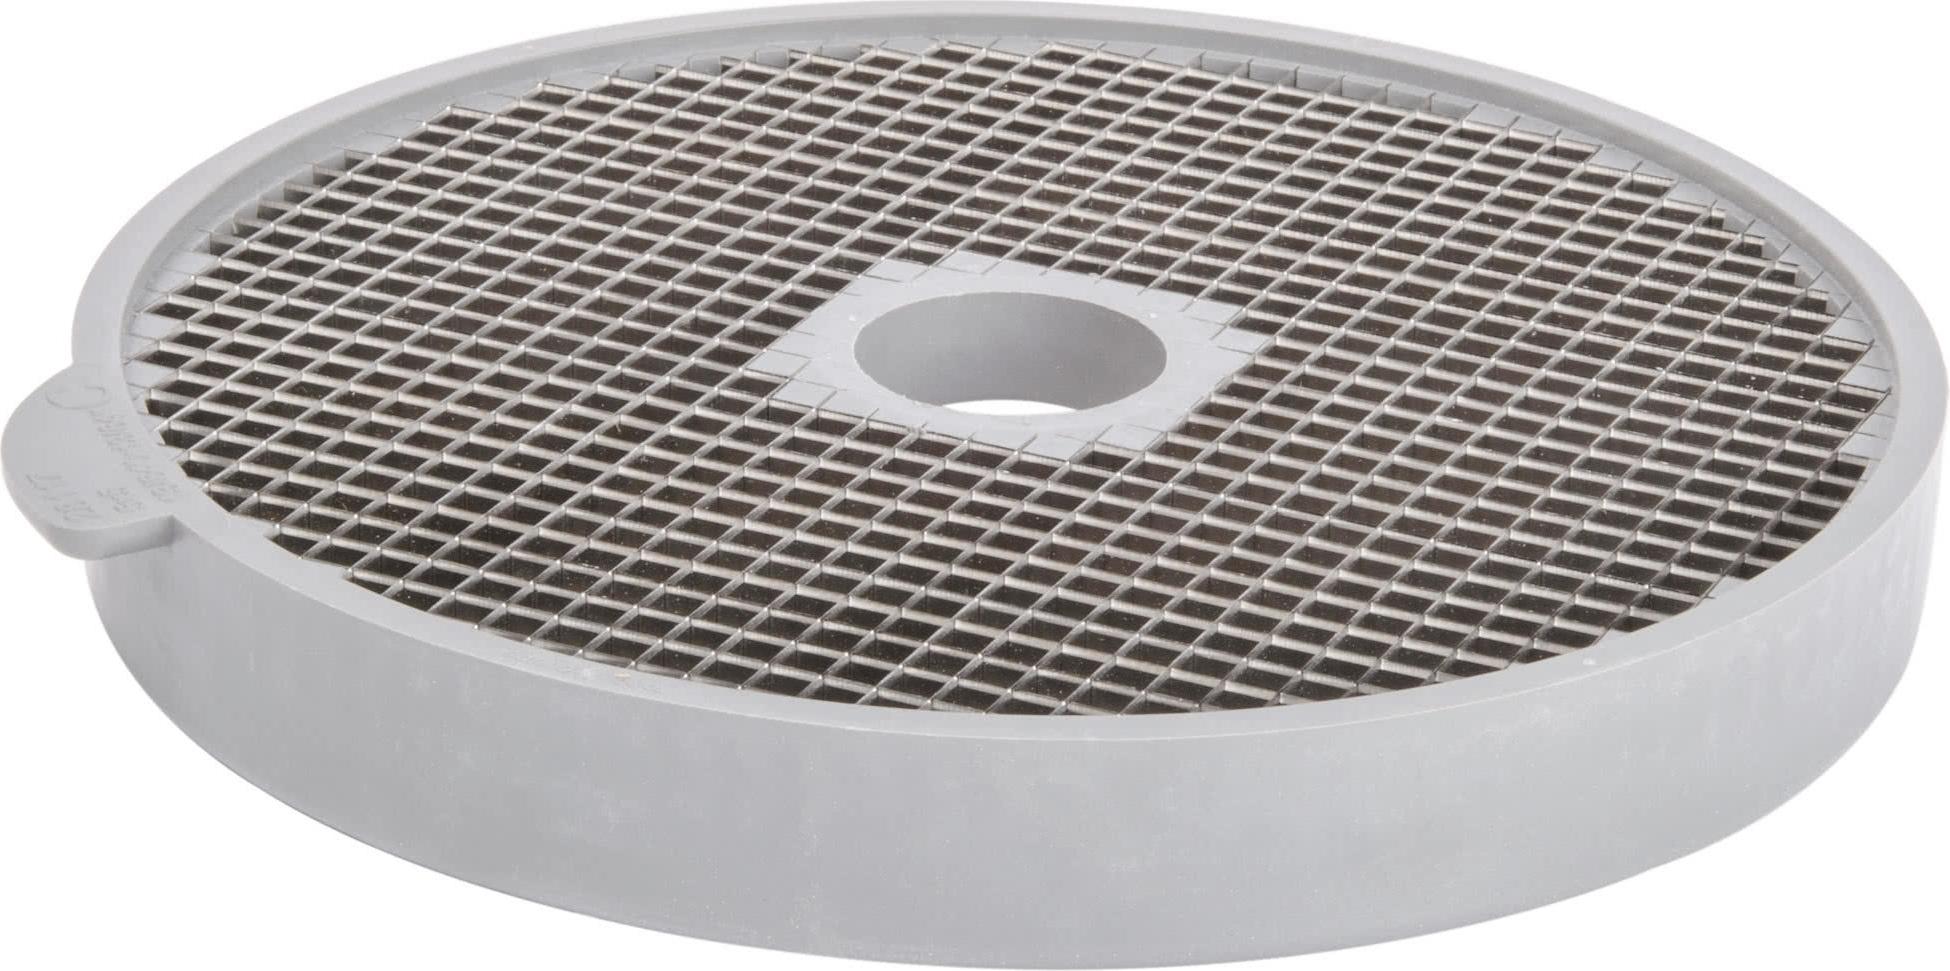 Диск-решётка Robot Coupe 28117 (5x5 мм) для кубиков - 2